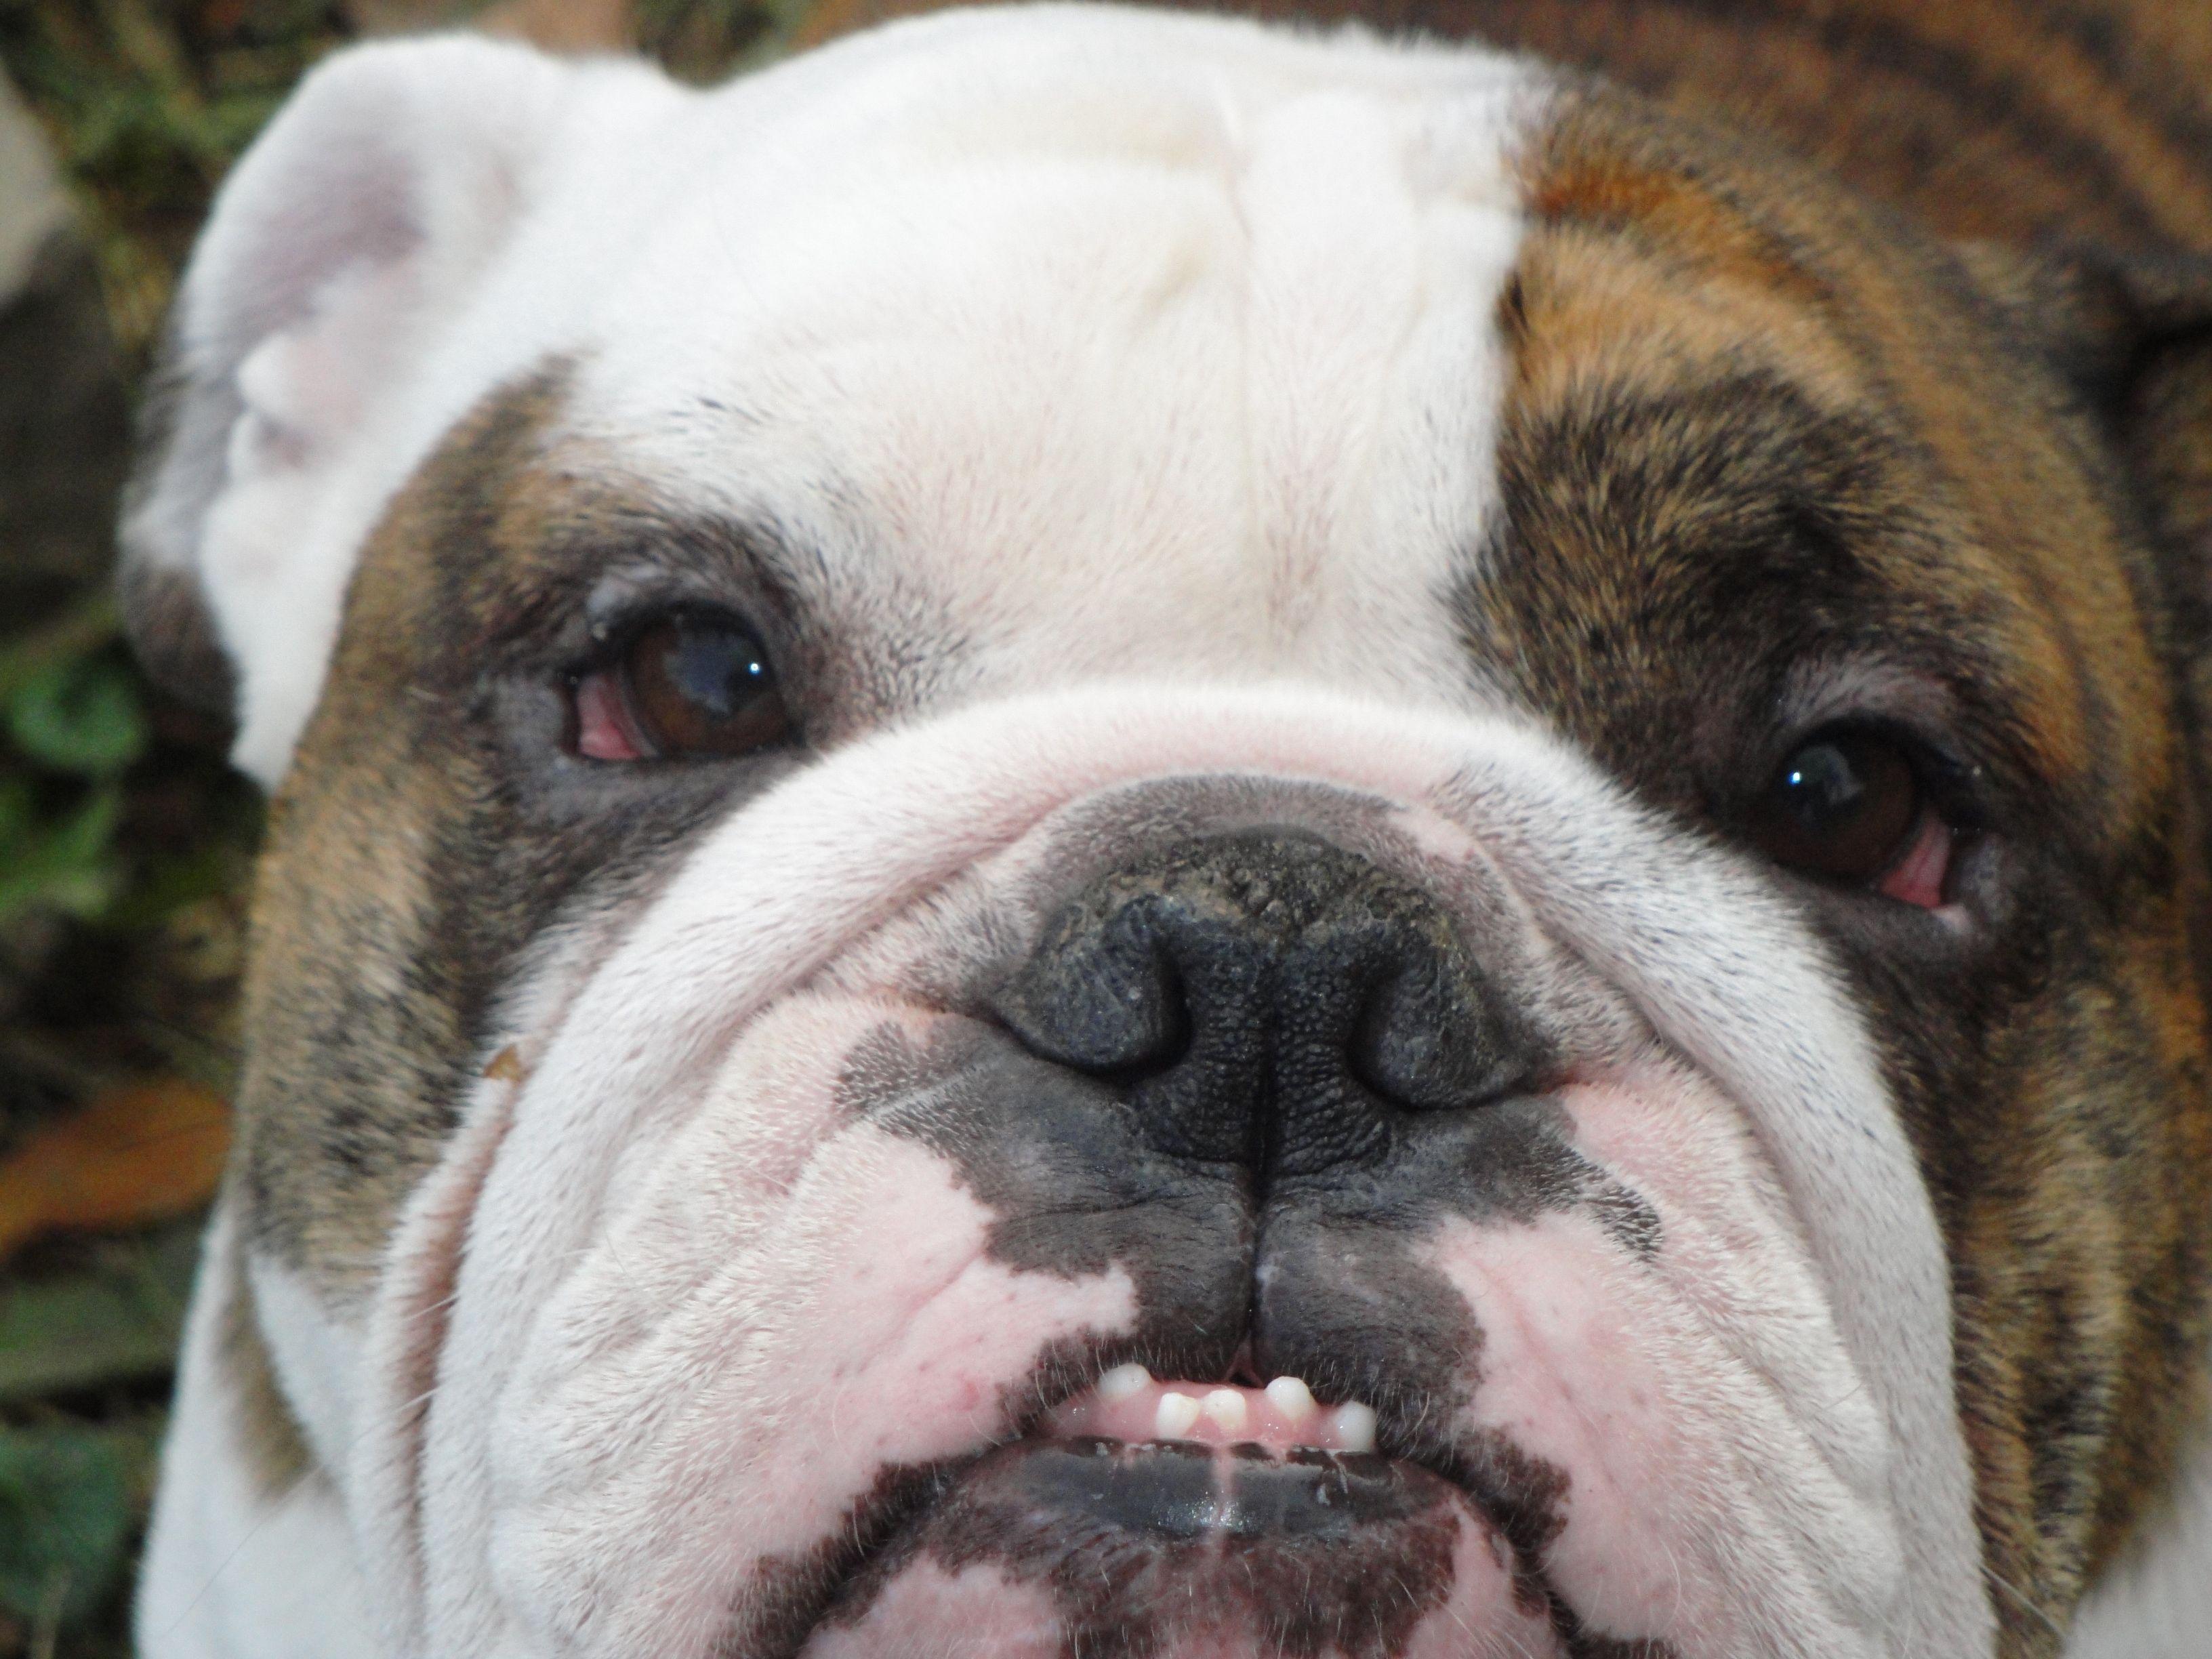 Bulldog Too Cute I Want Them ALL!!! Dogs, Animals